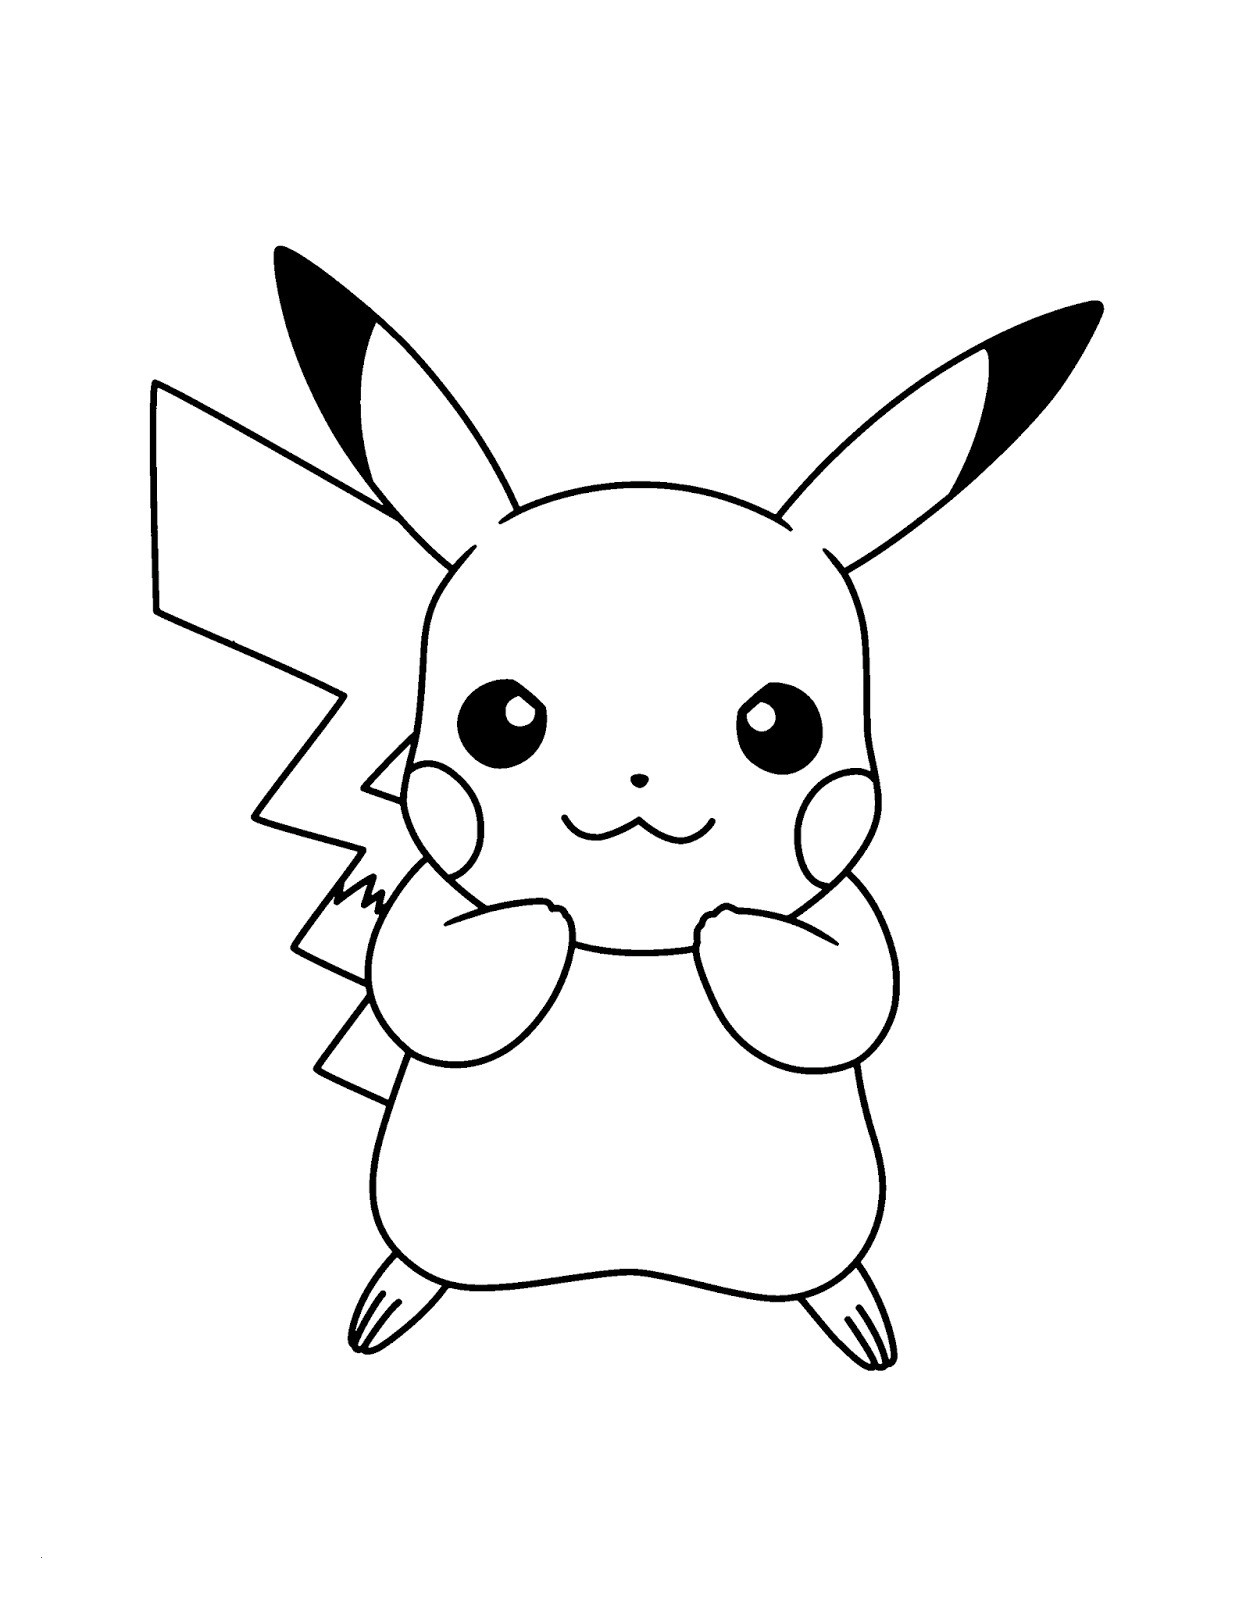 Malvorlage Paw Patrol Genial Pikachu Ausmalbild Pokemon Pinterest Schön Ausmalbilder Paw Patrol Stock